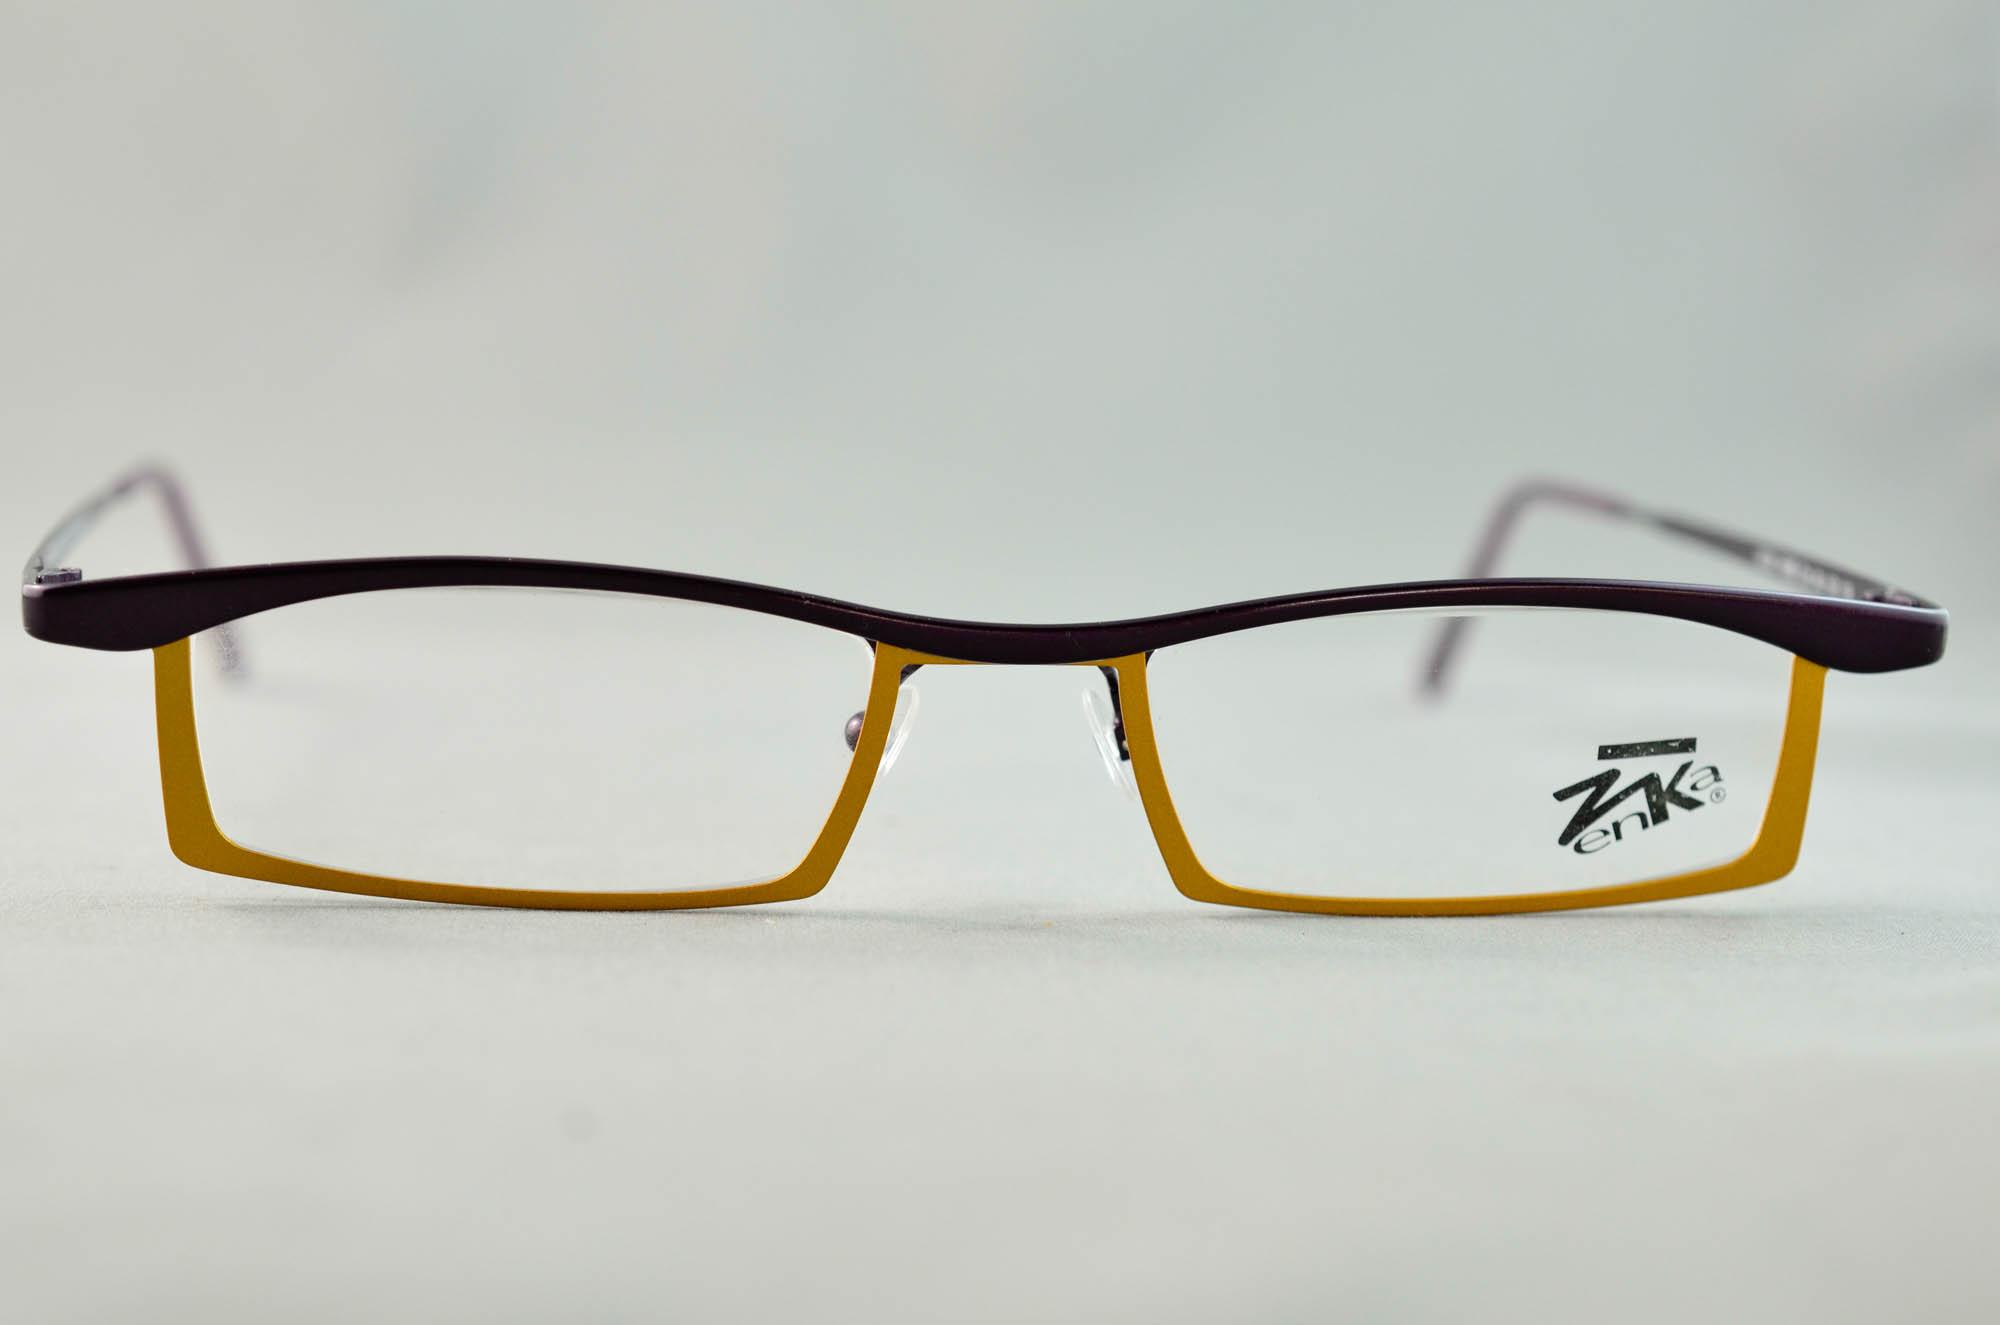 Zenka Eyewear Australia - eyewear near me aaba23737d9f